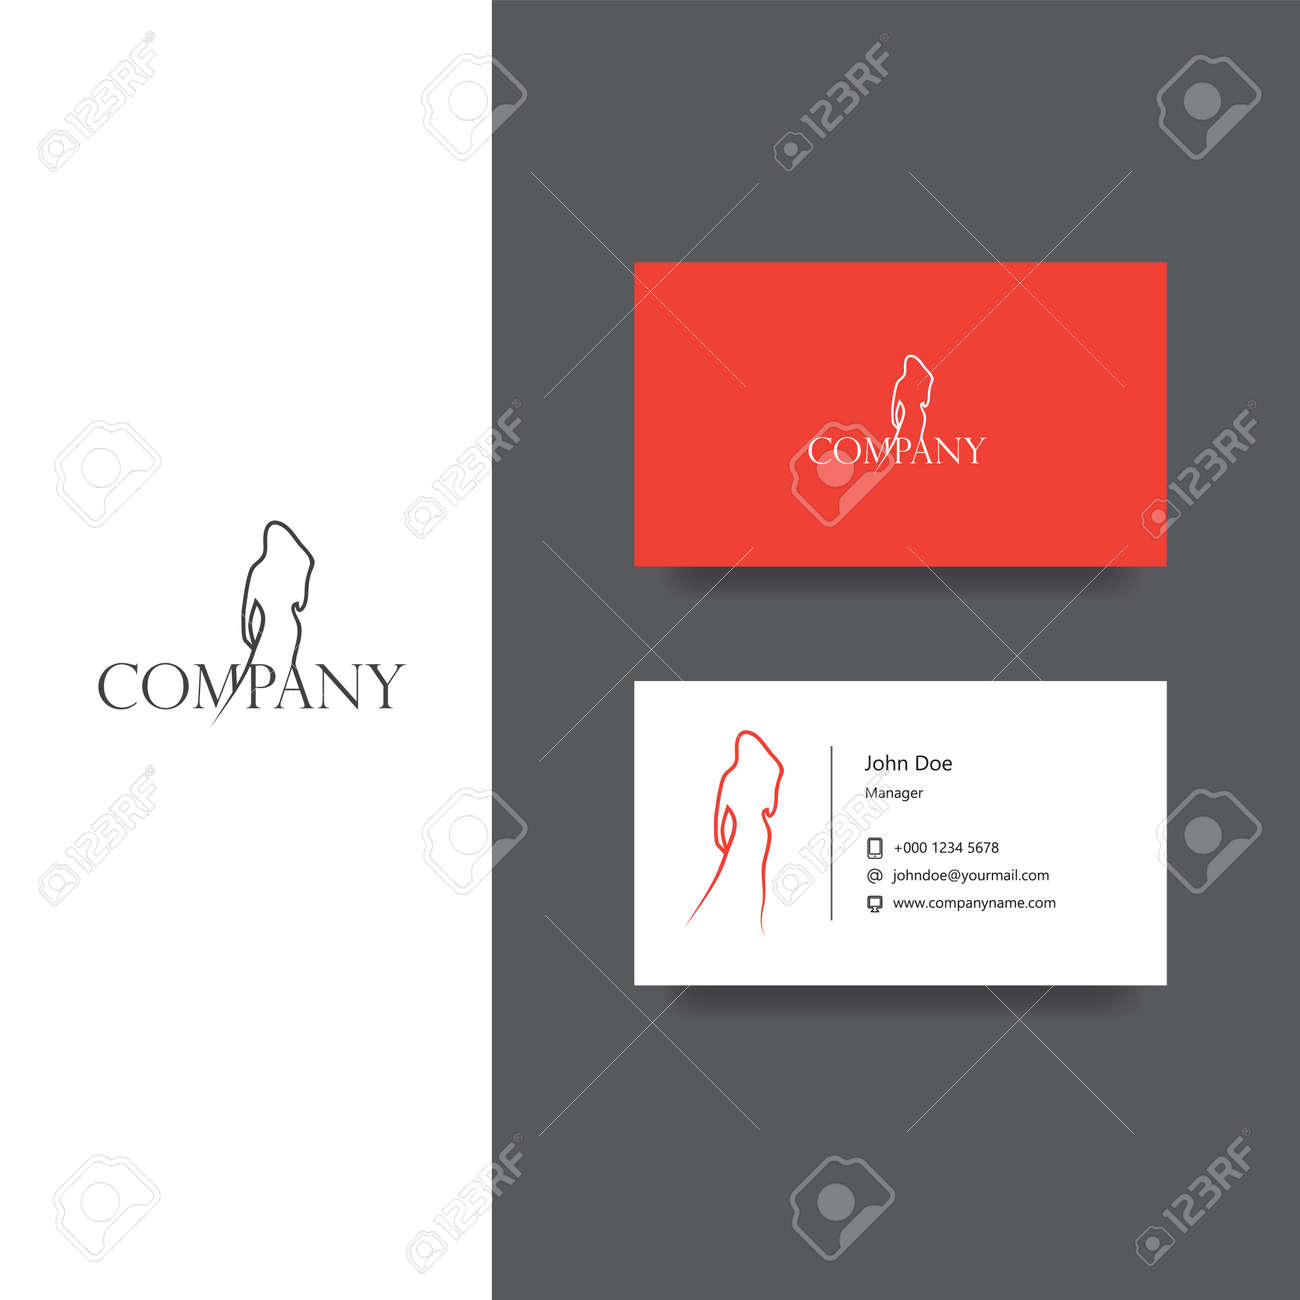 Logo De La Socit Oriente Vers Mode Et Modle Carte